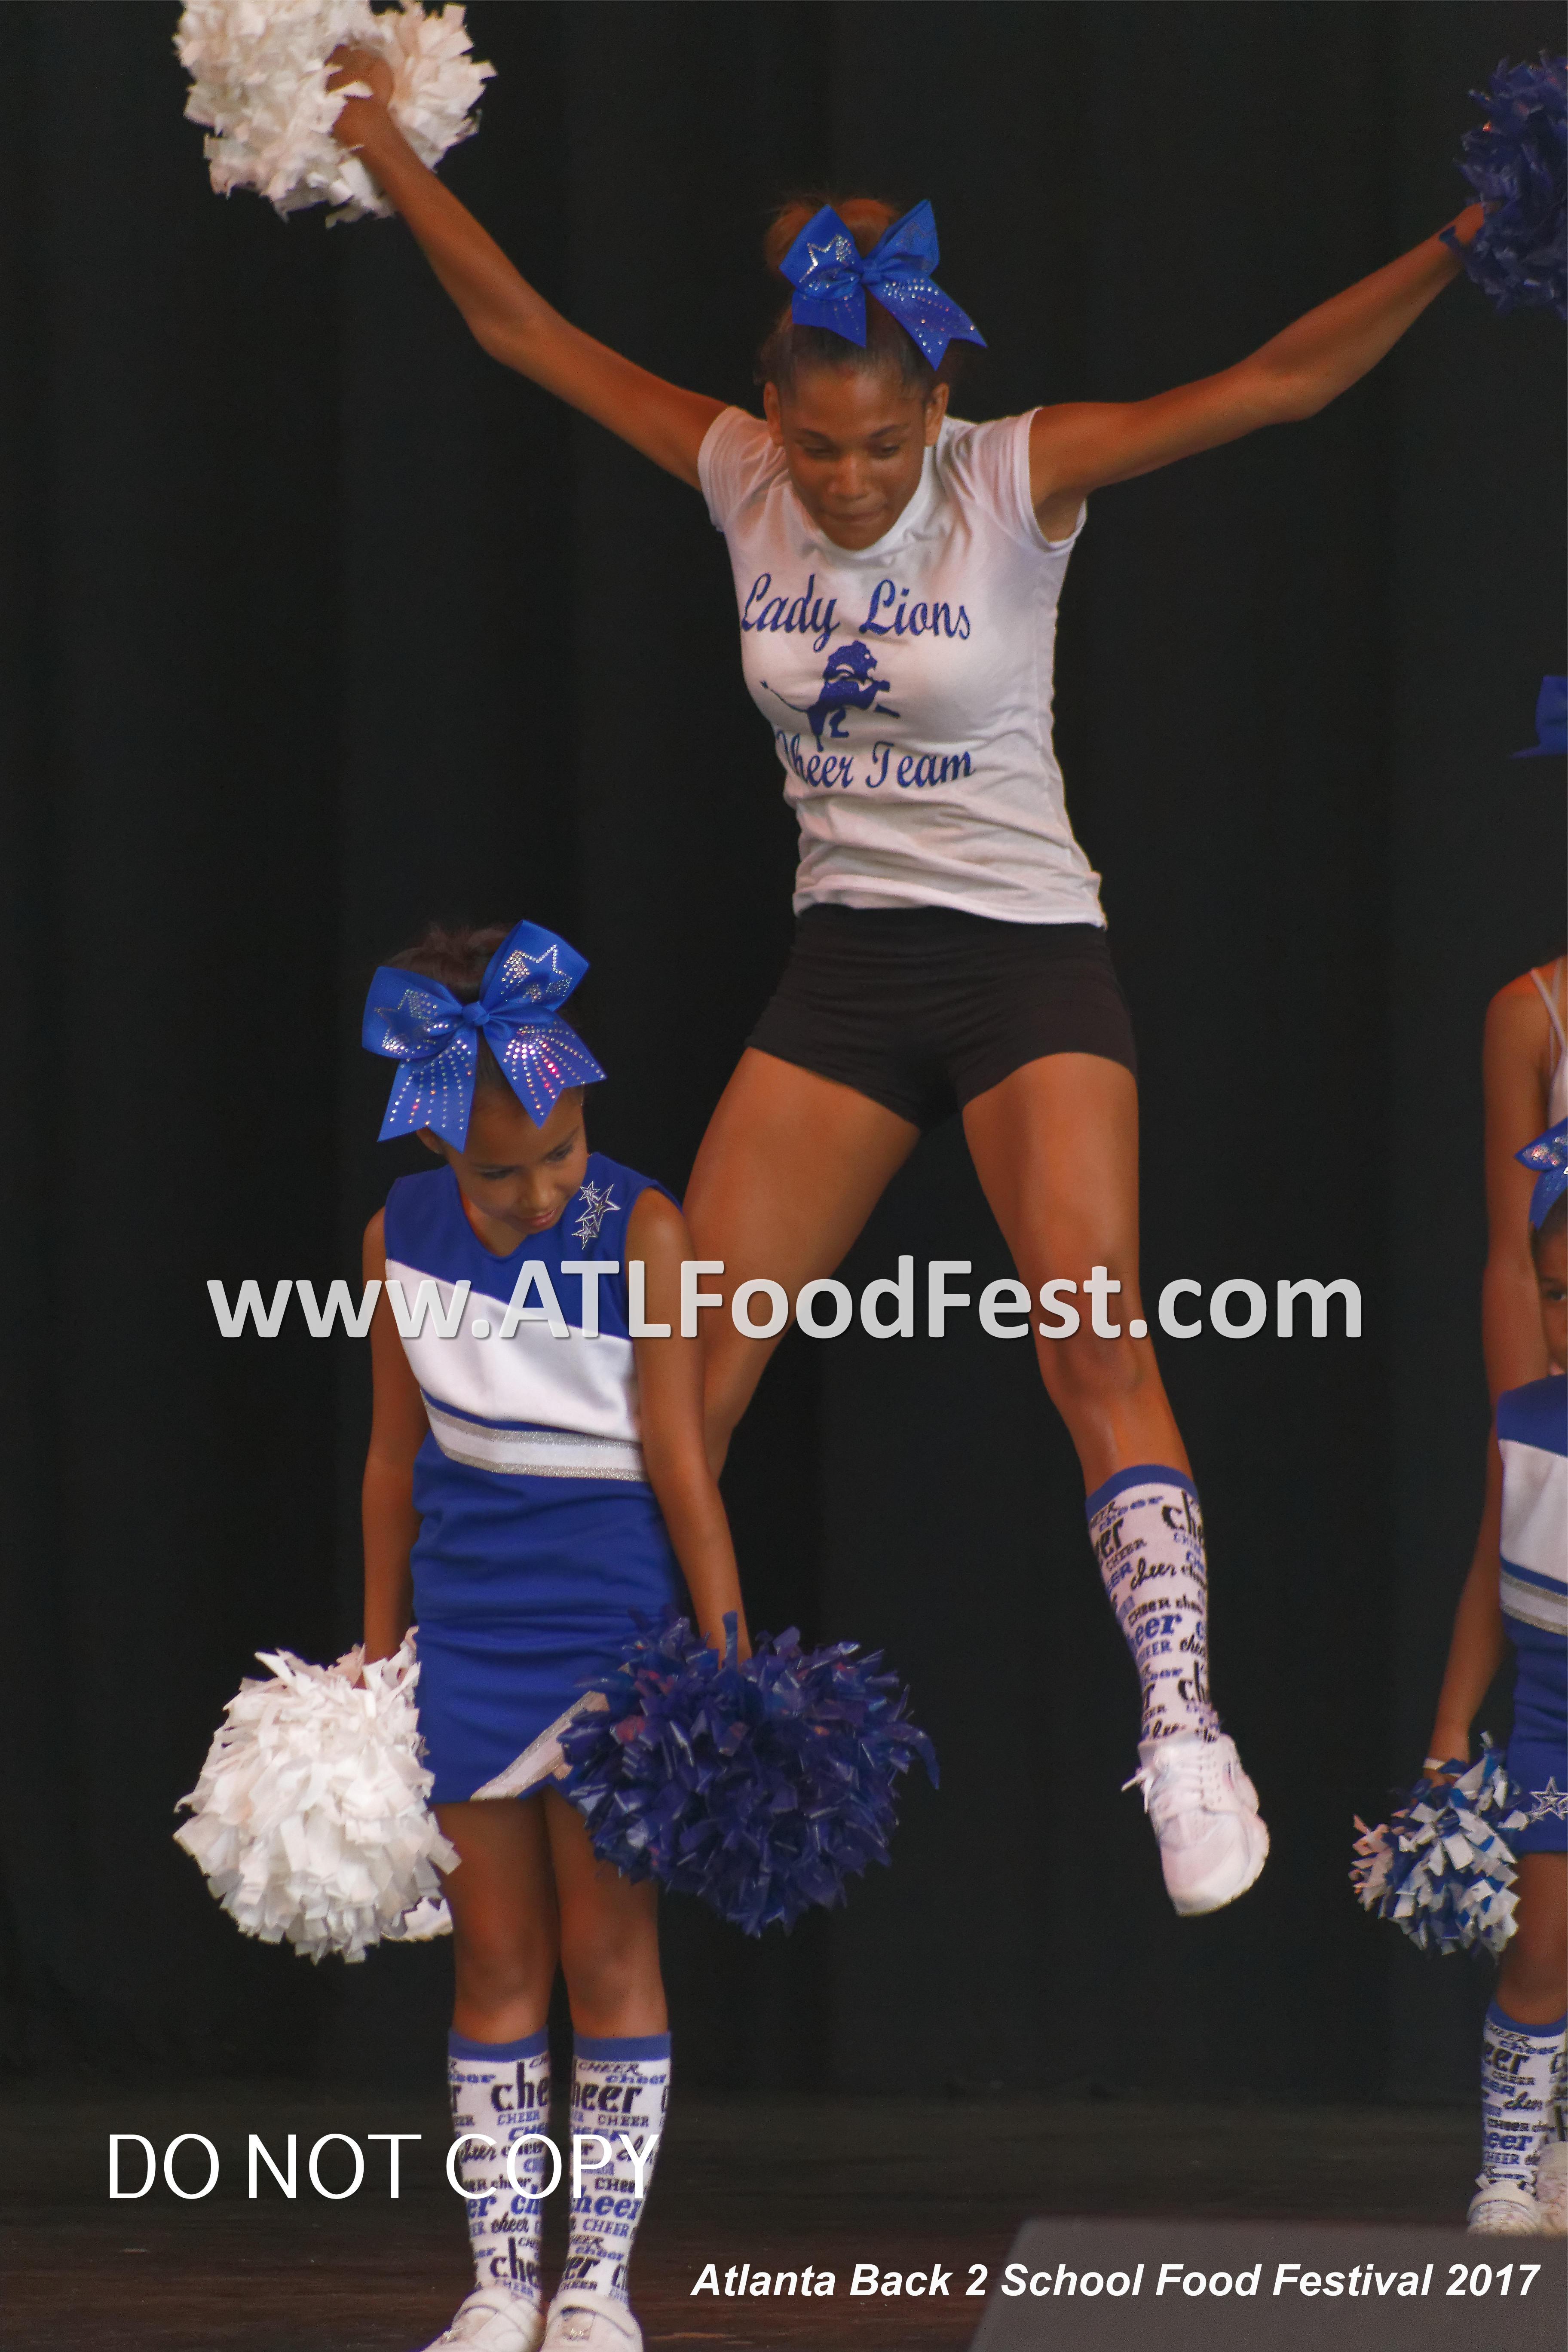 Atlanta Back 2 School Food Festival